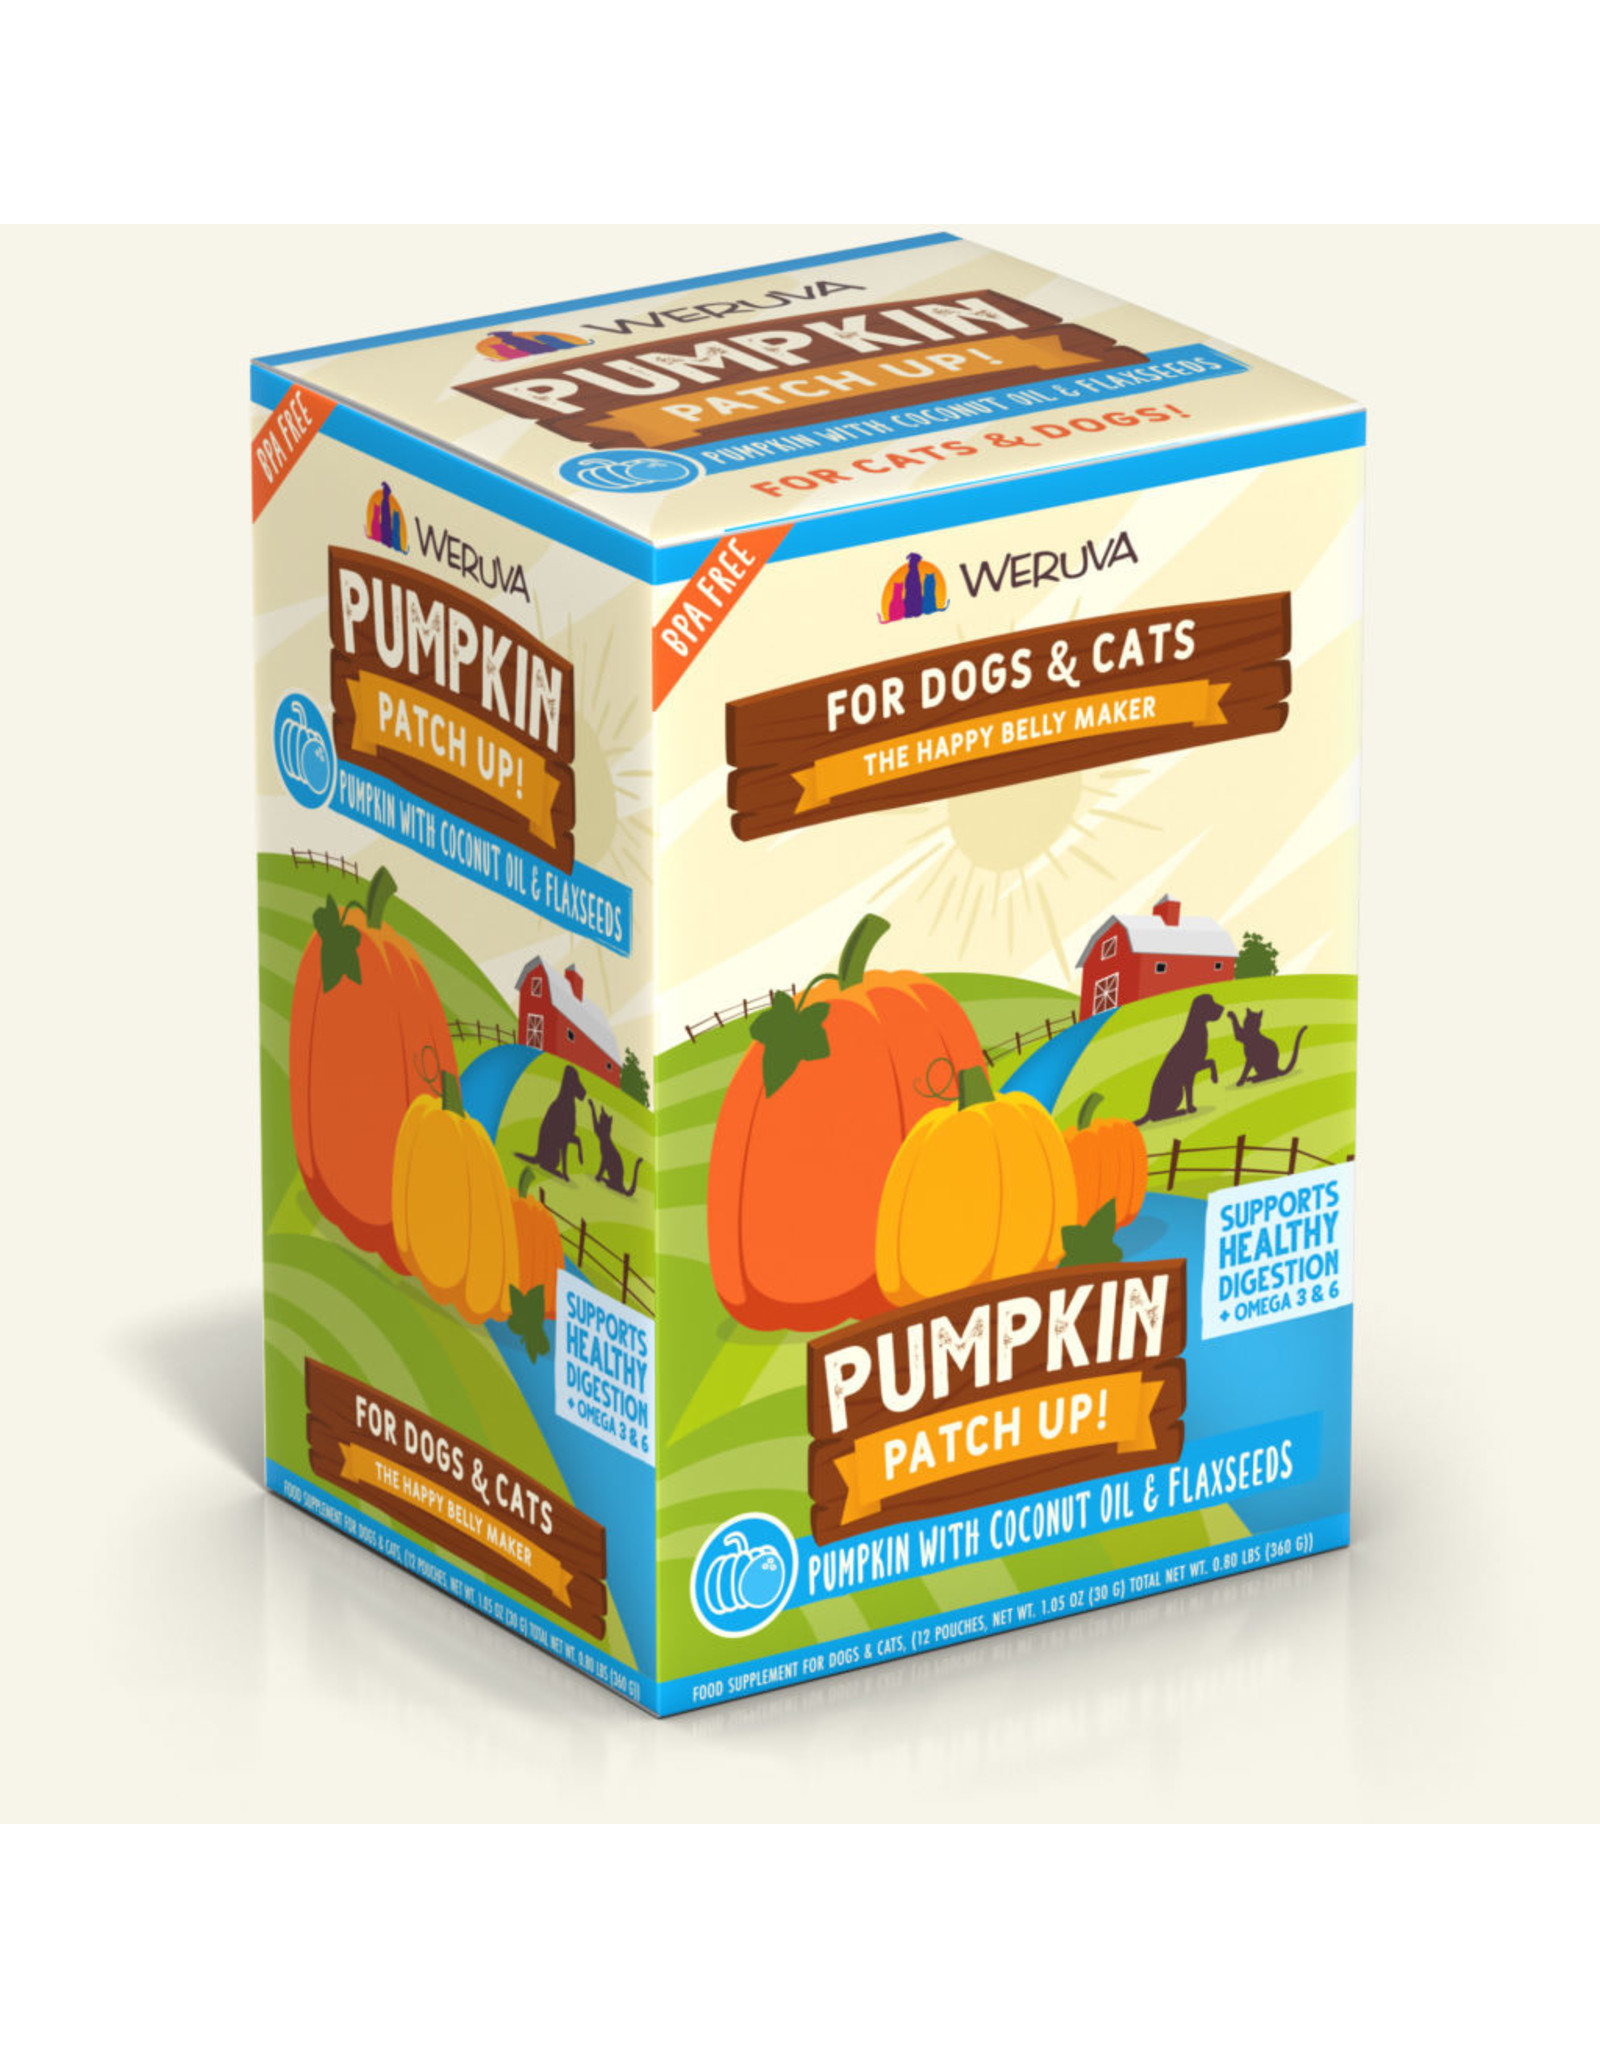 Weruva Weruva Pumpkin Patch Up! Pumpkin with Coconut Oil & Flaxseed 1.05oz